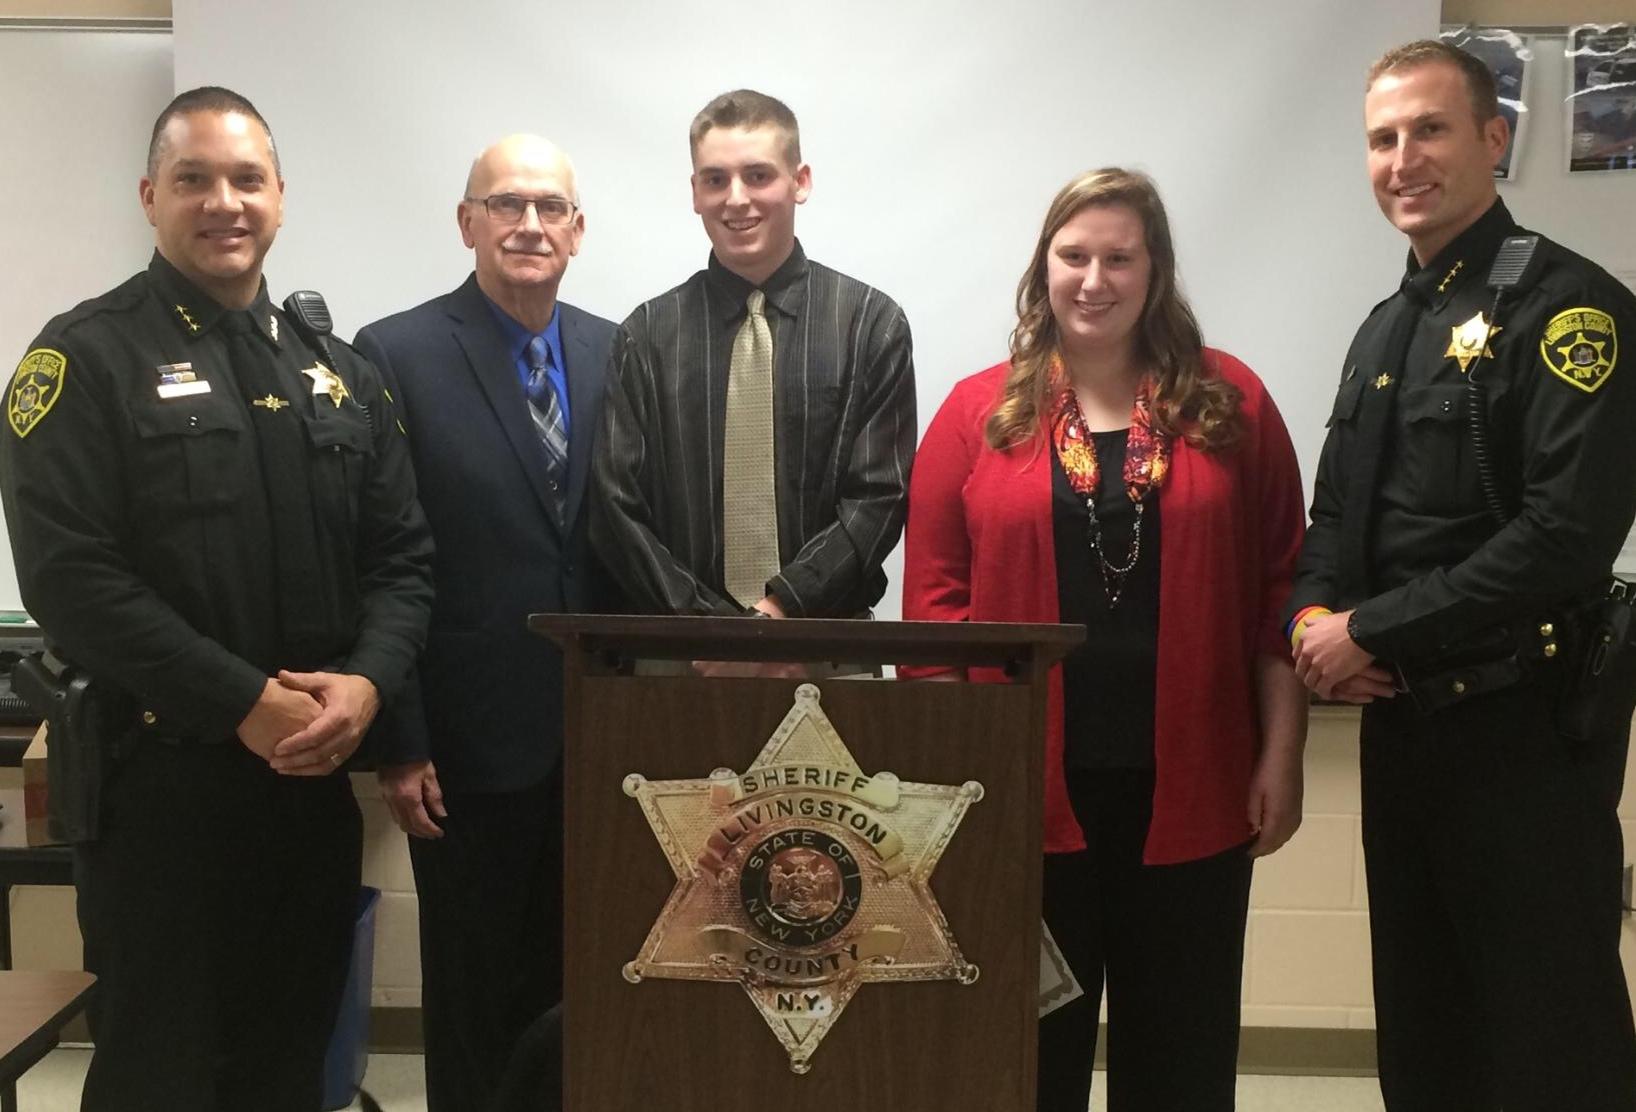 Sheriffs Association Sponsors Outstanding Local Criminal Justice Students